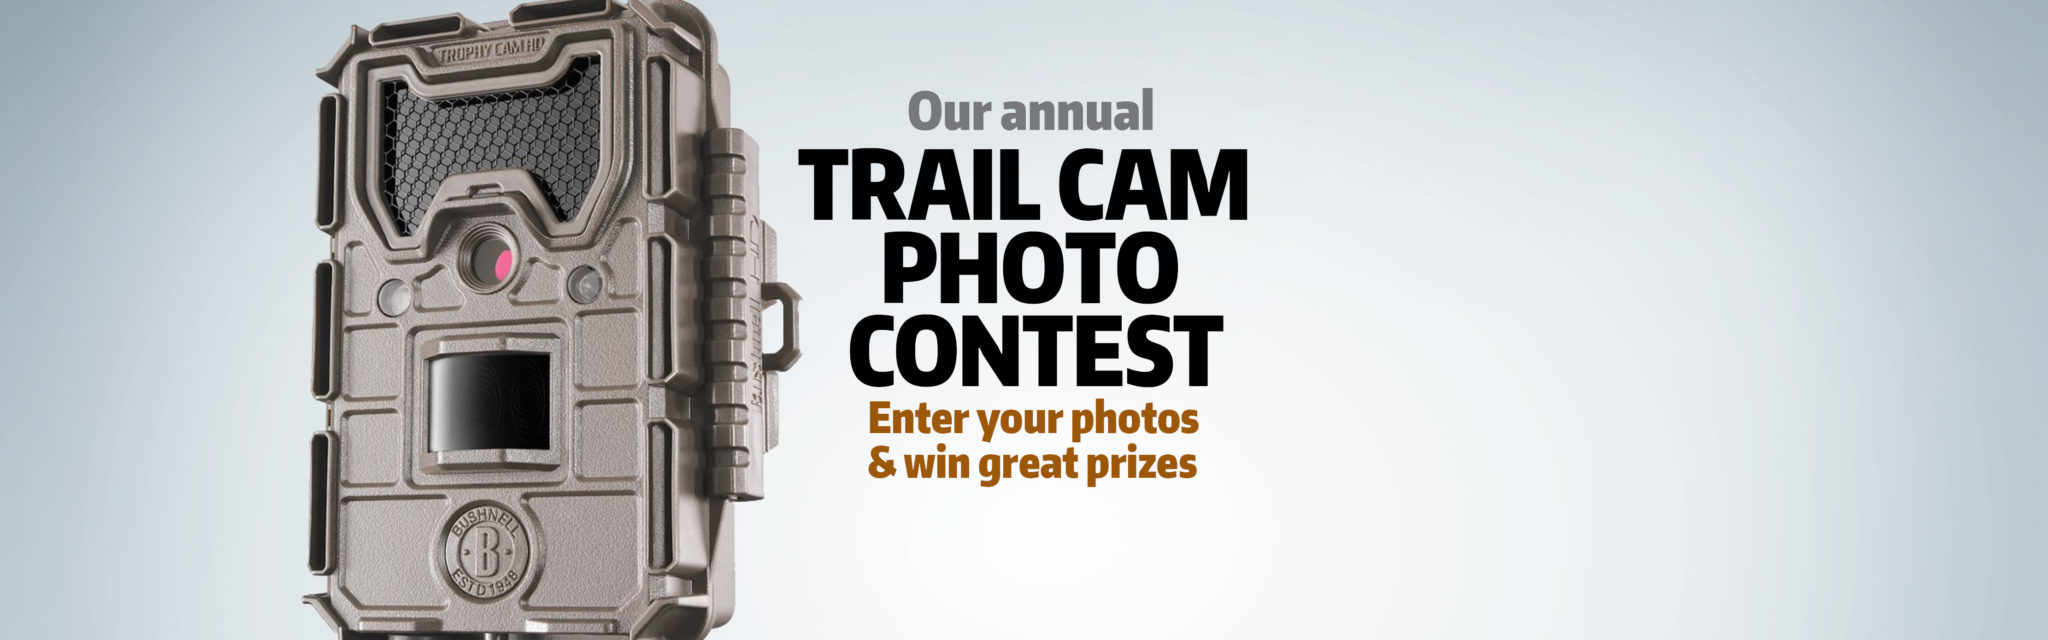 trail cam contest